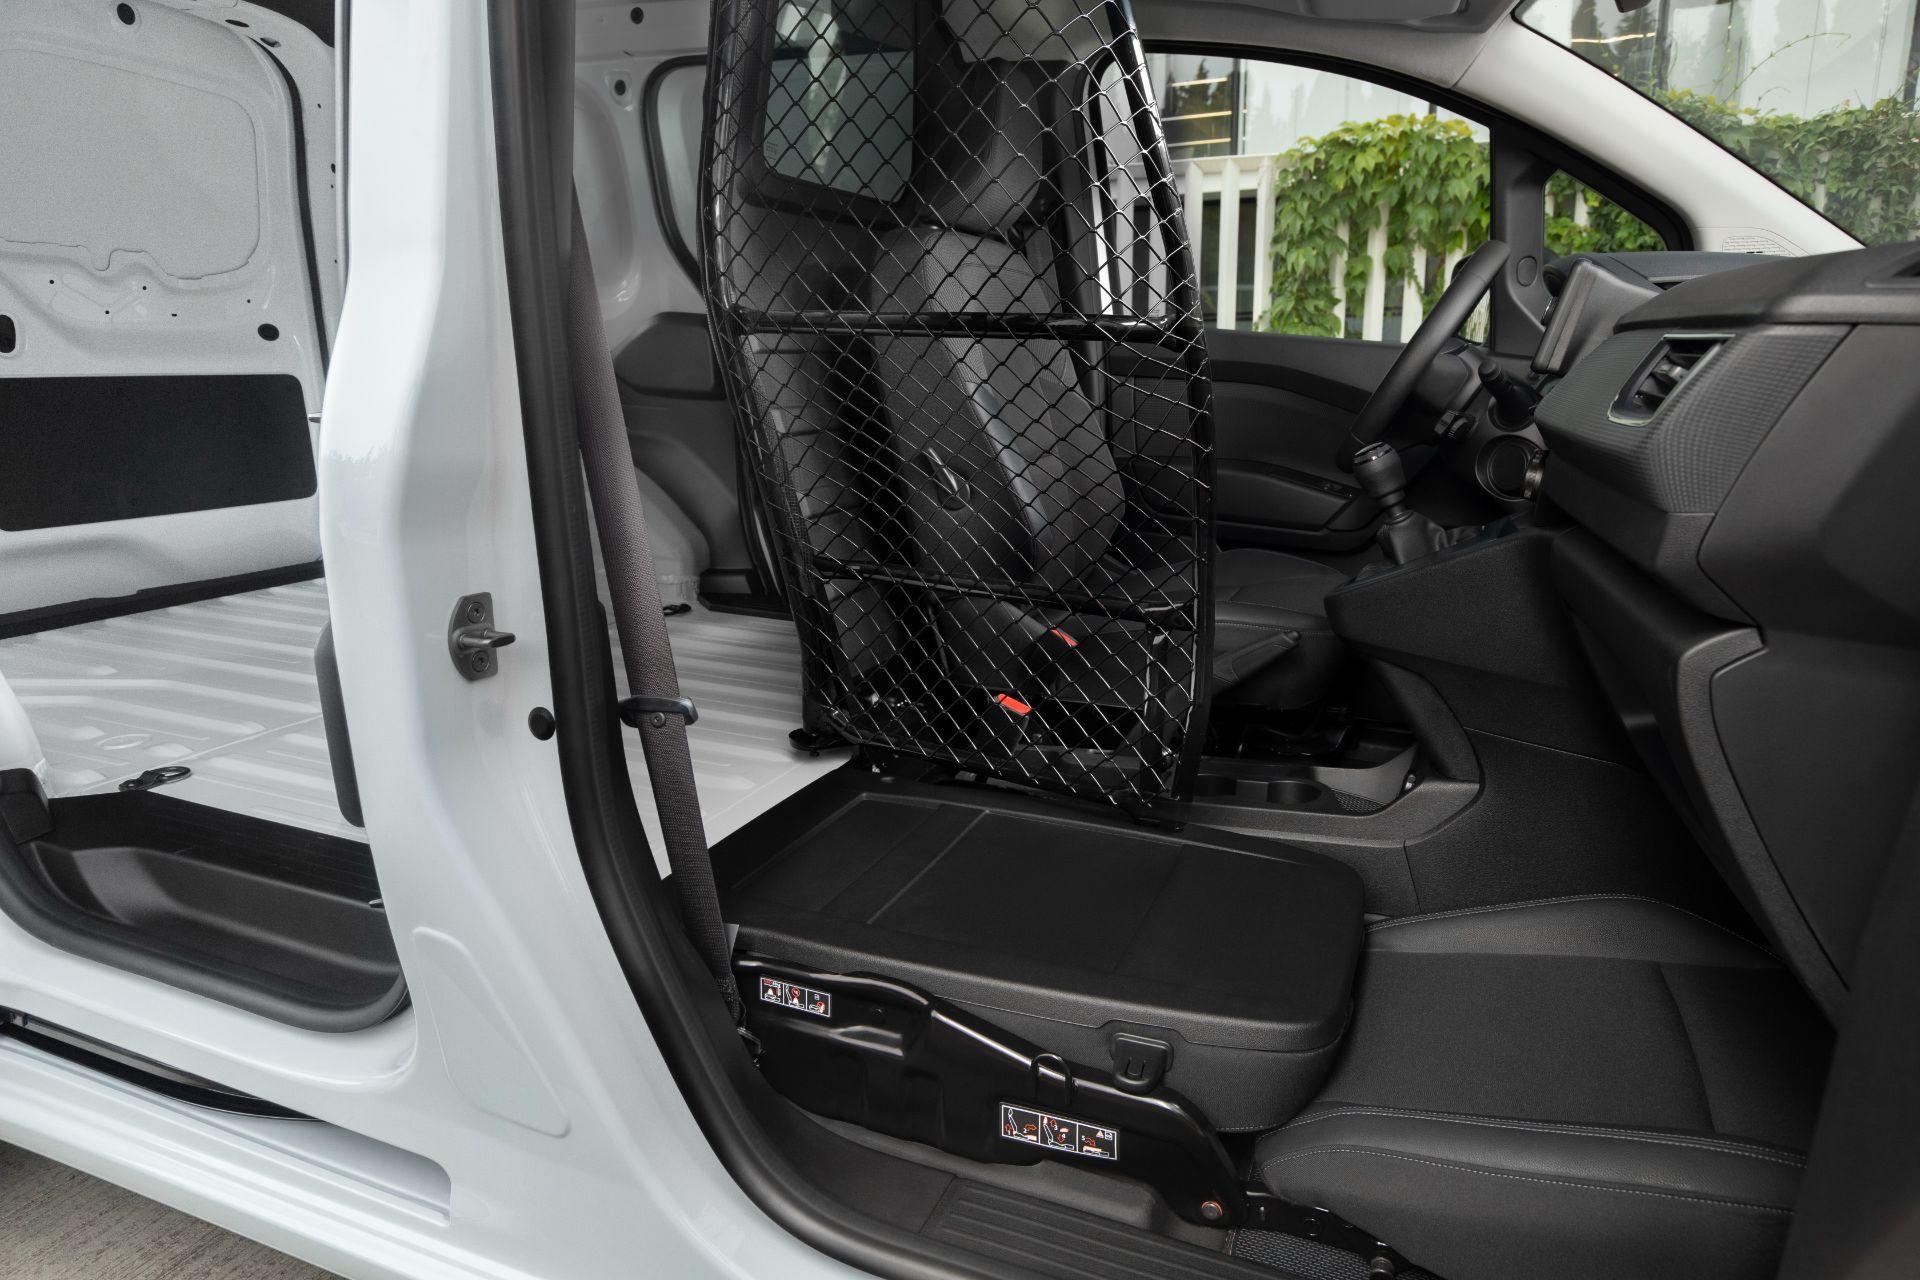 2022-Nissan-Townstar-petrol-van-dynamic-30